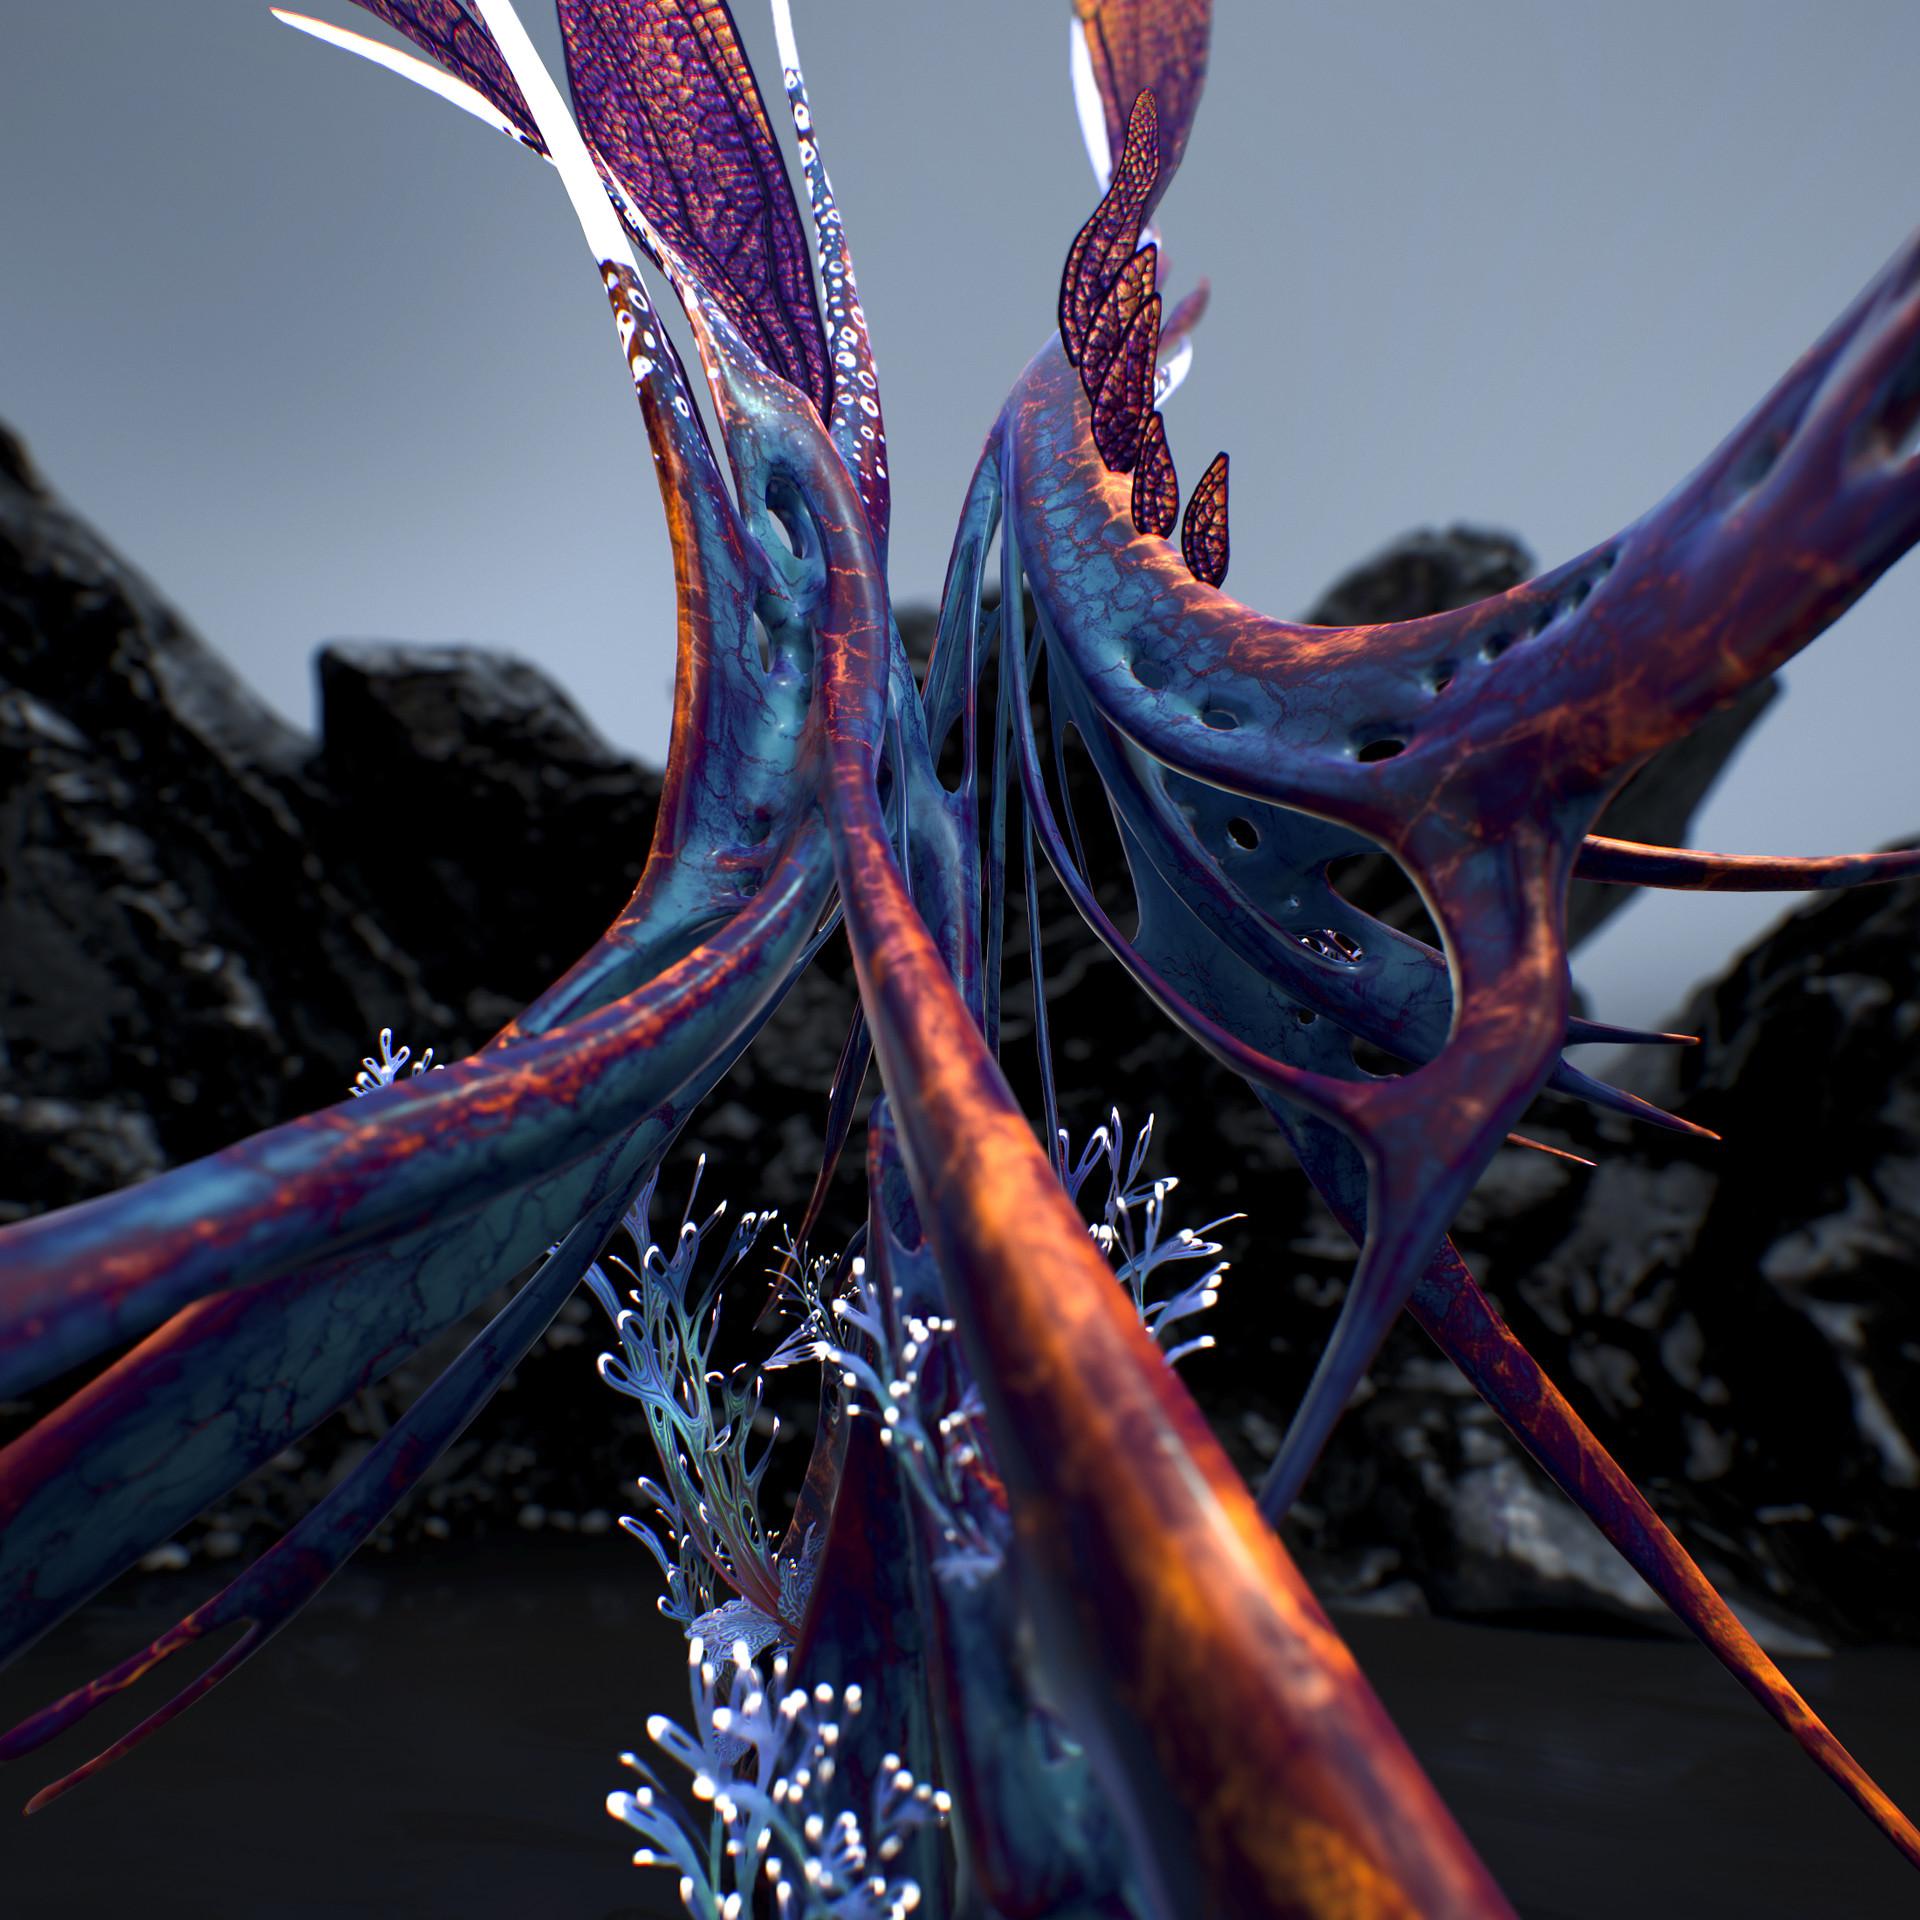 Johan de leenheer alien fern misota spletinus33